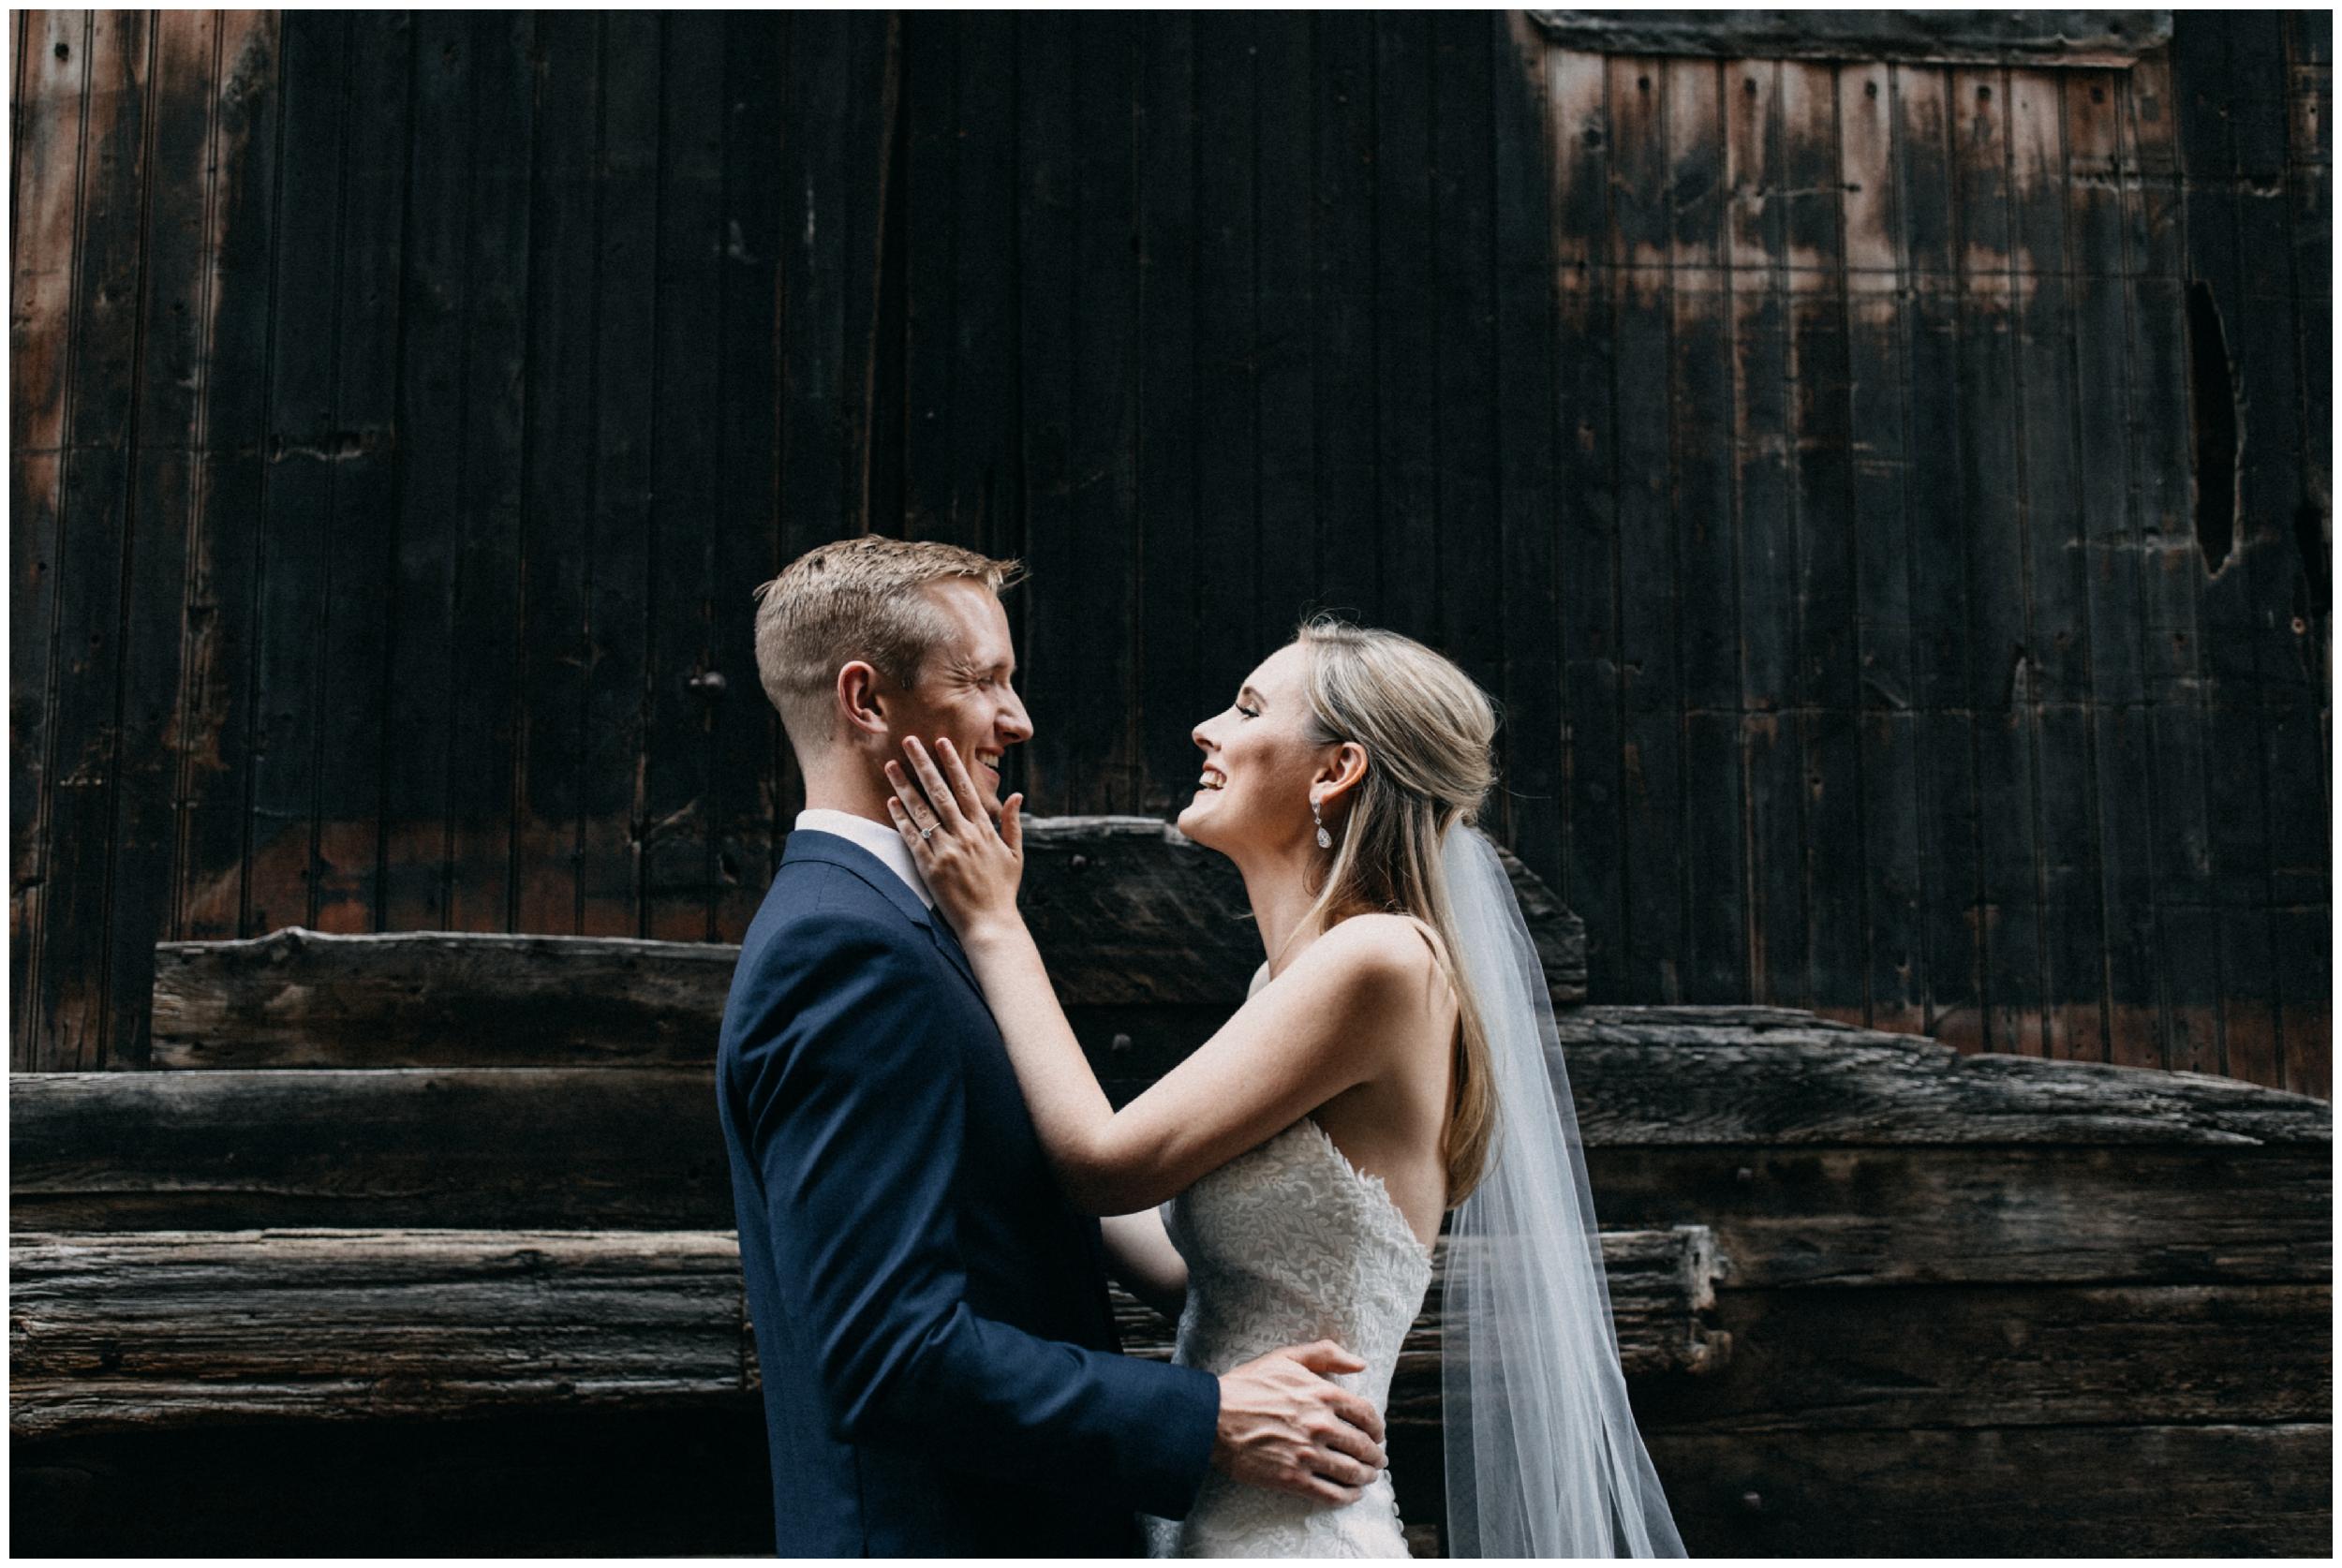 Warehouse wedding in Minneapolis MN